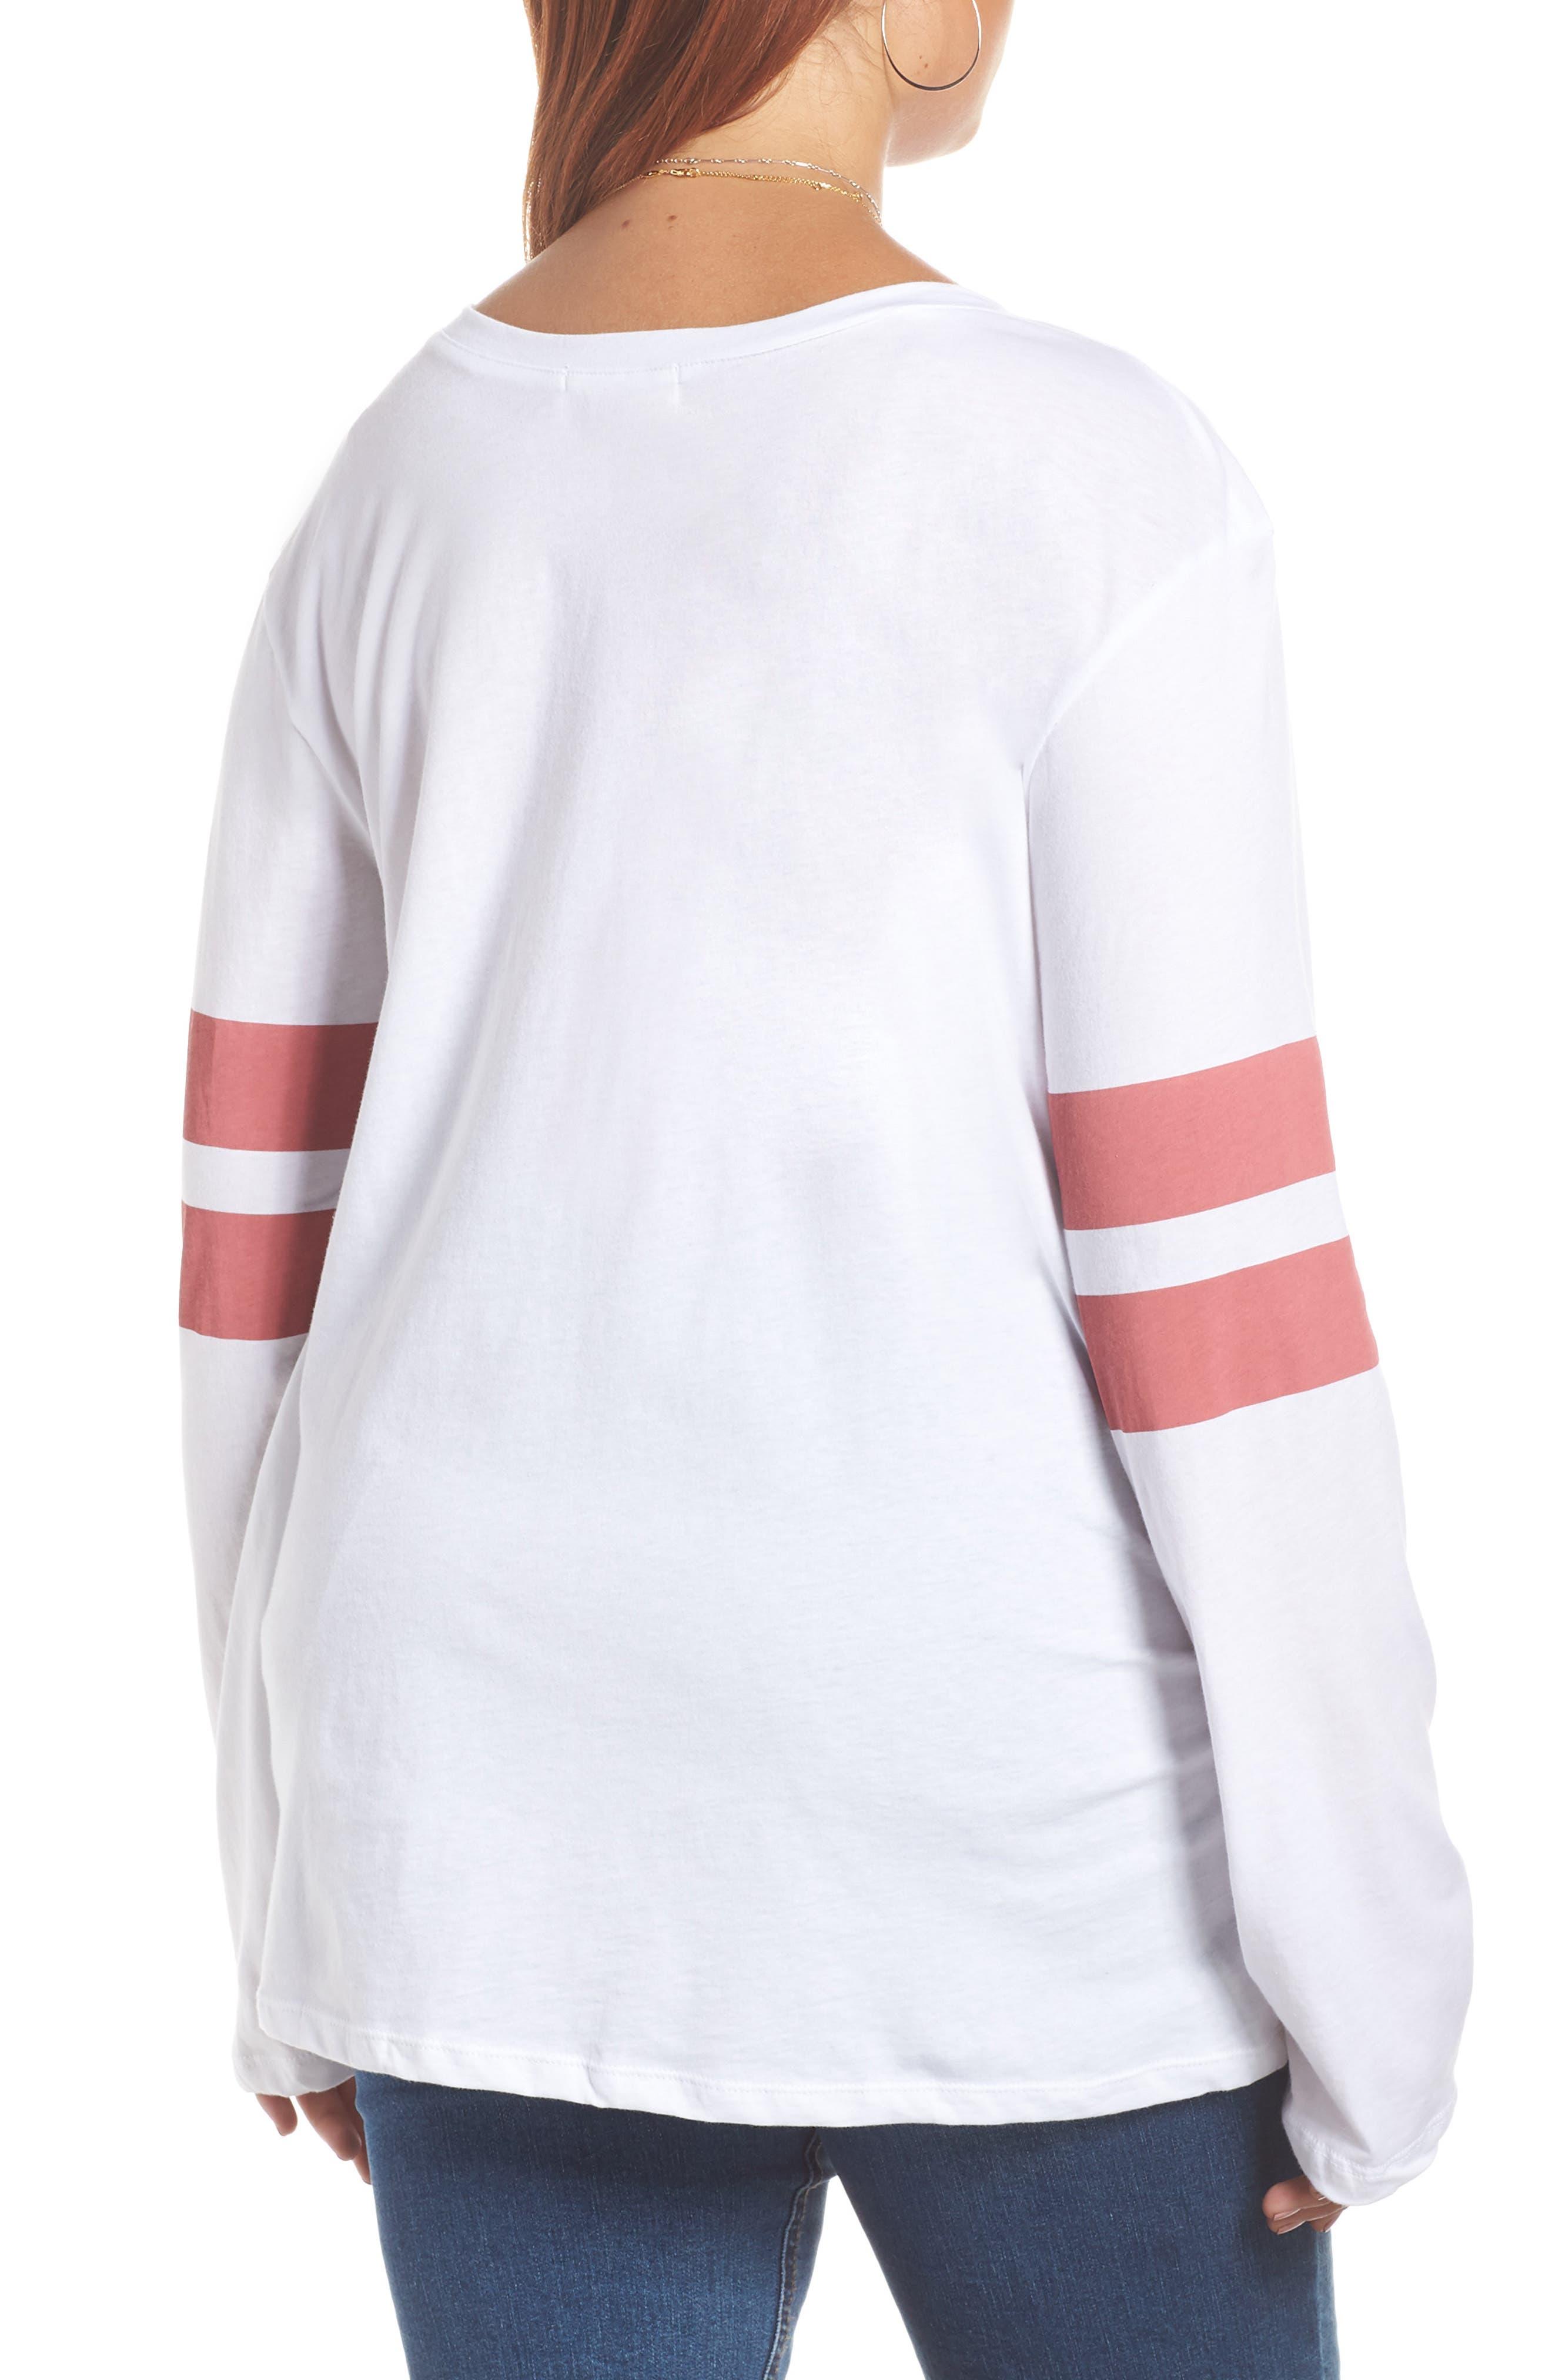 Varsity Stripe Tee,                             Alternate thumbnail 9, color,                             WHITE- RED BAROQUE COMBO